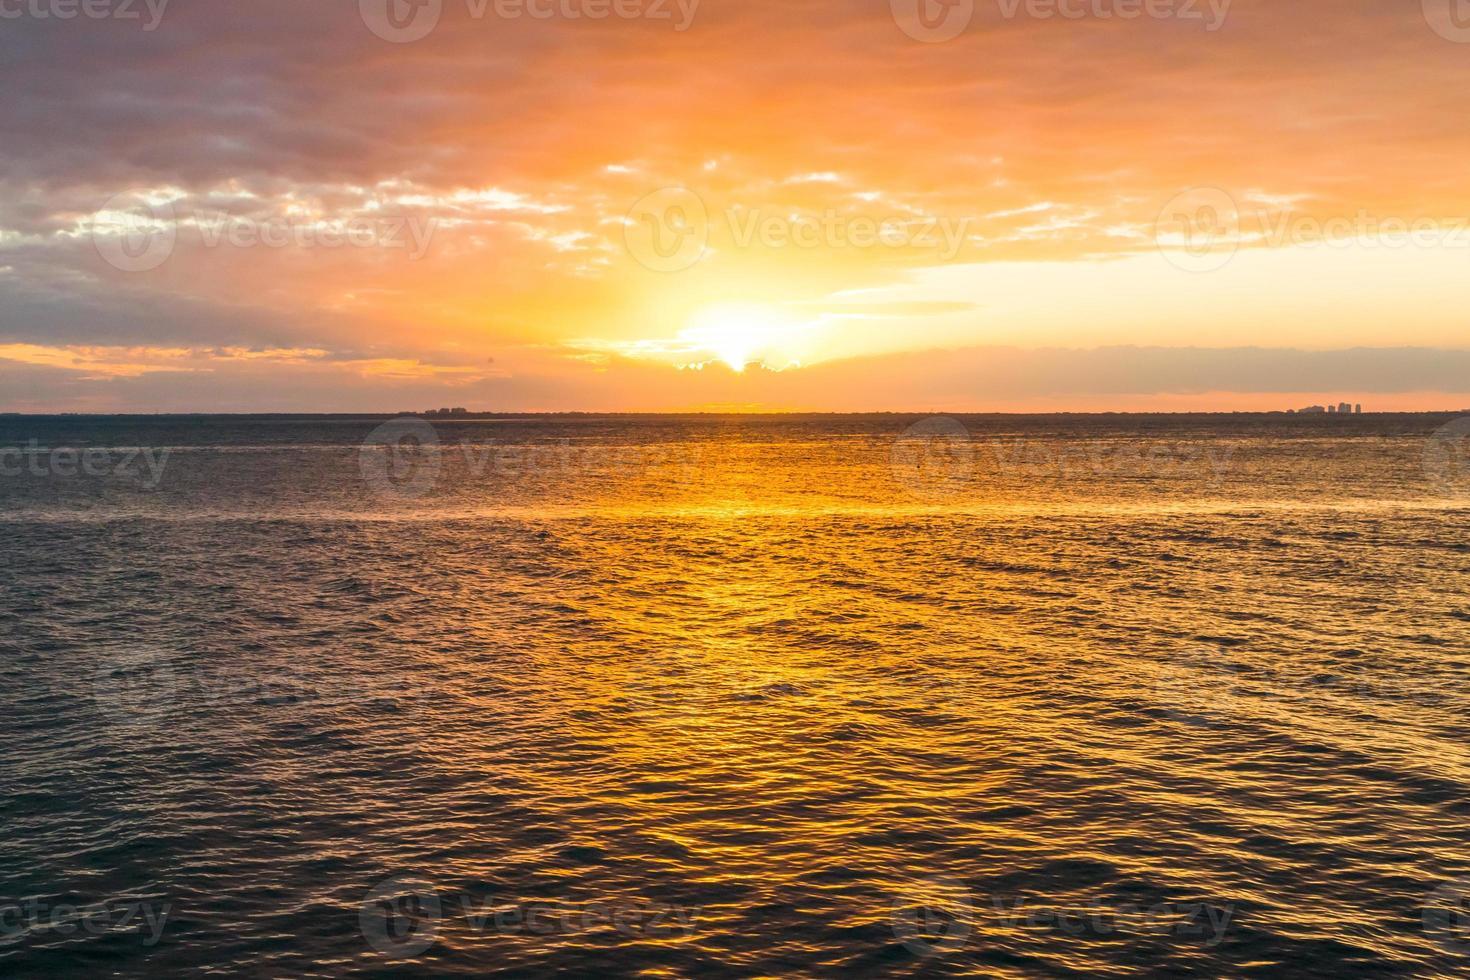 coucher de soleil à miami beach photo